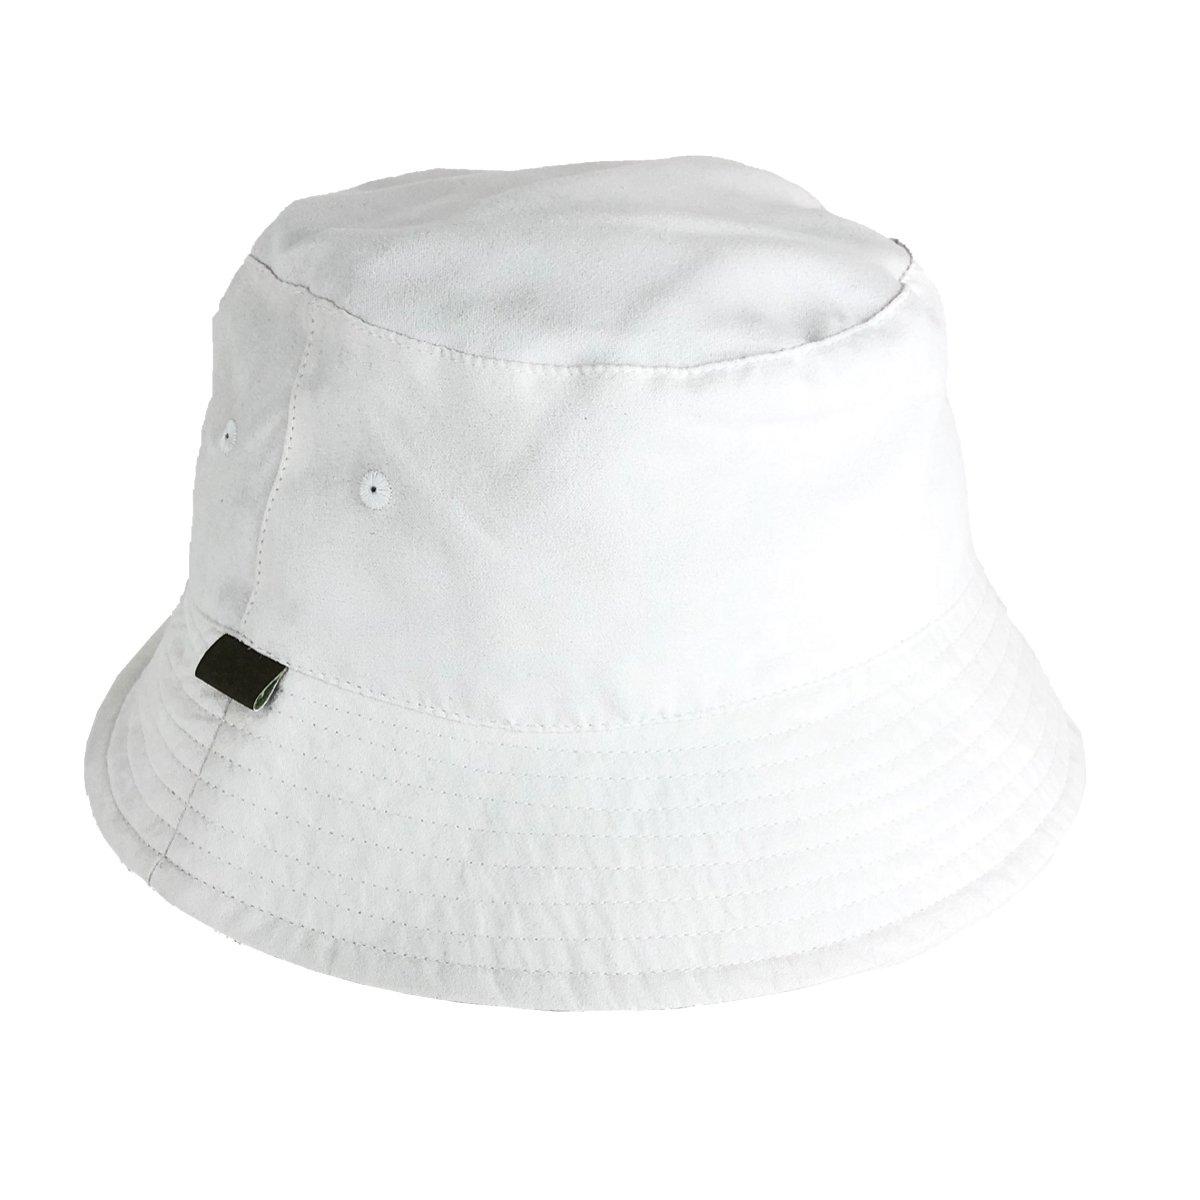 Suede Bucket Hat 詳細画像4